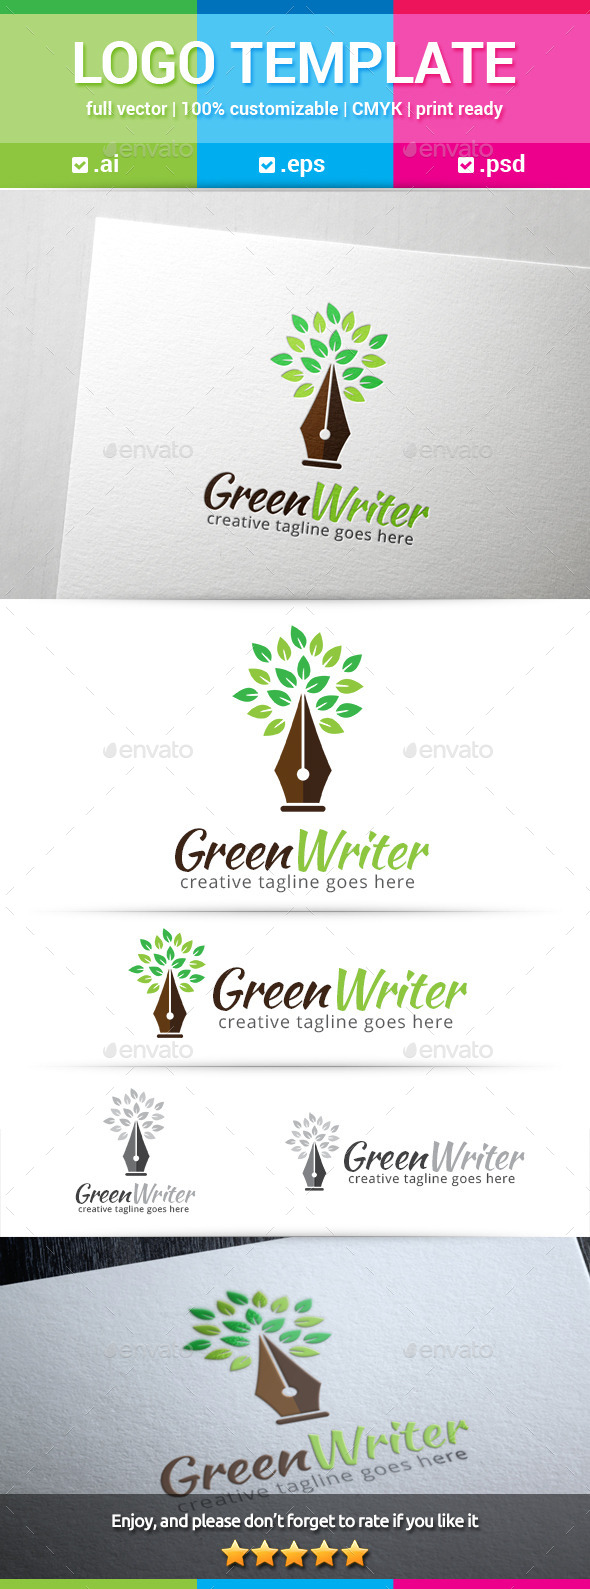 GraphicRiver Green Writer Logo 10599744